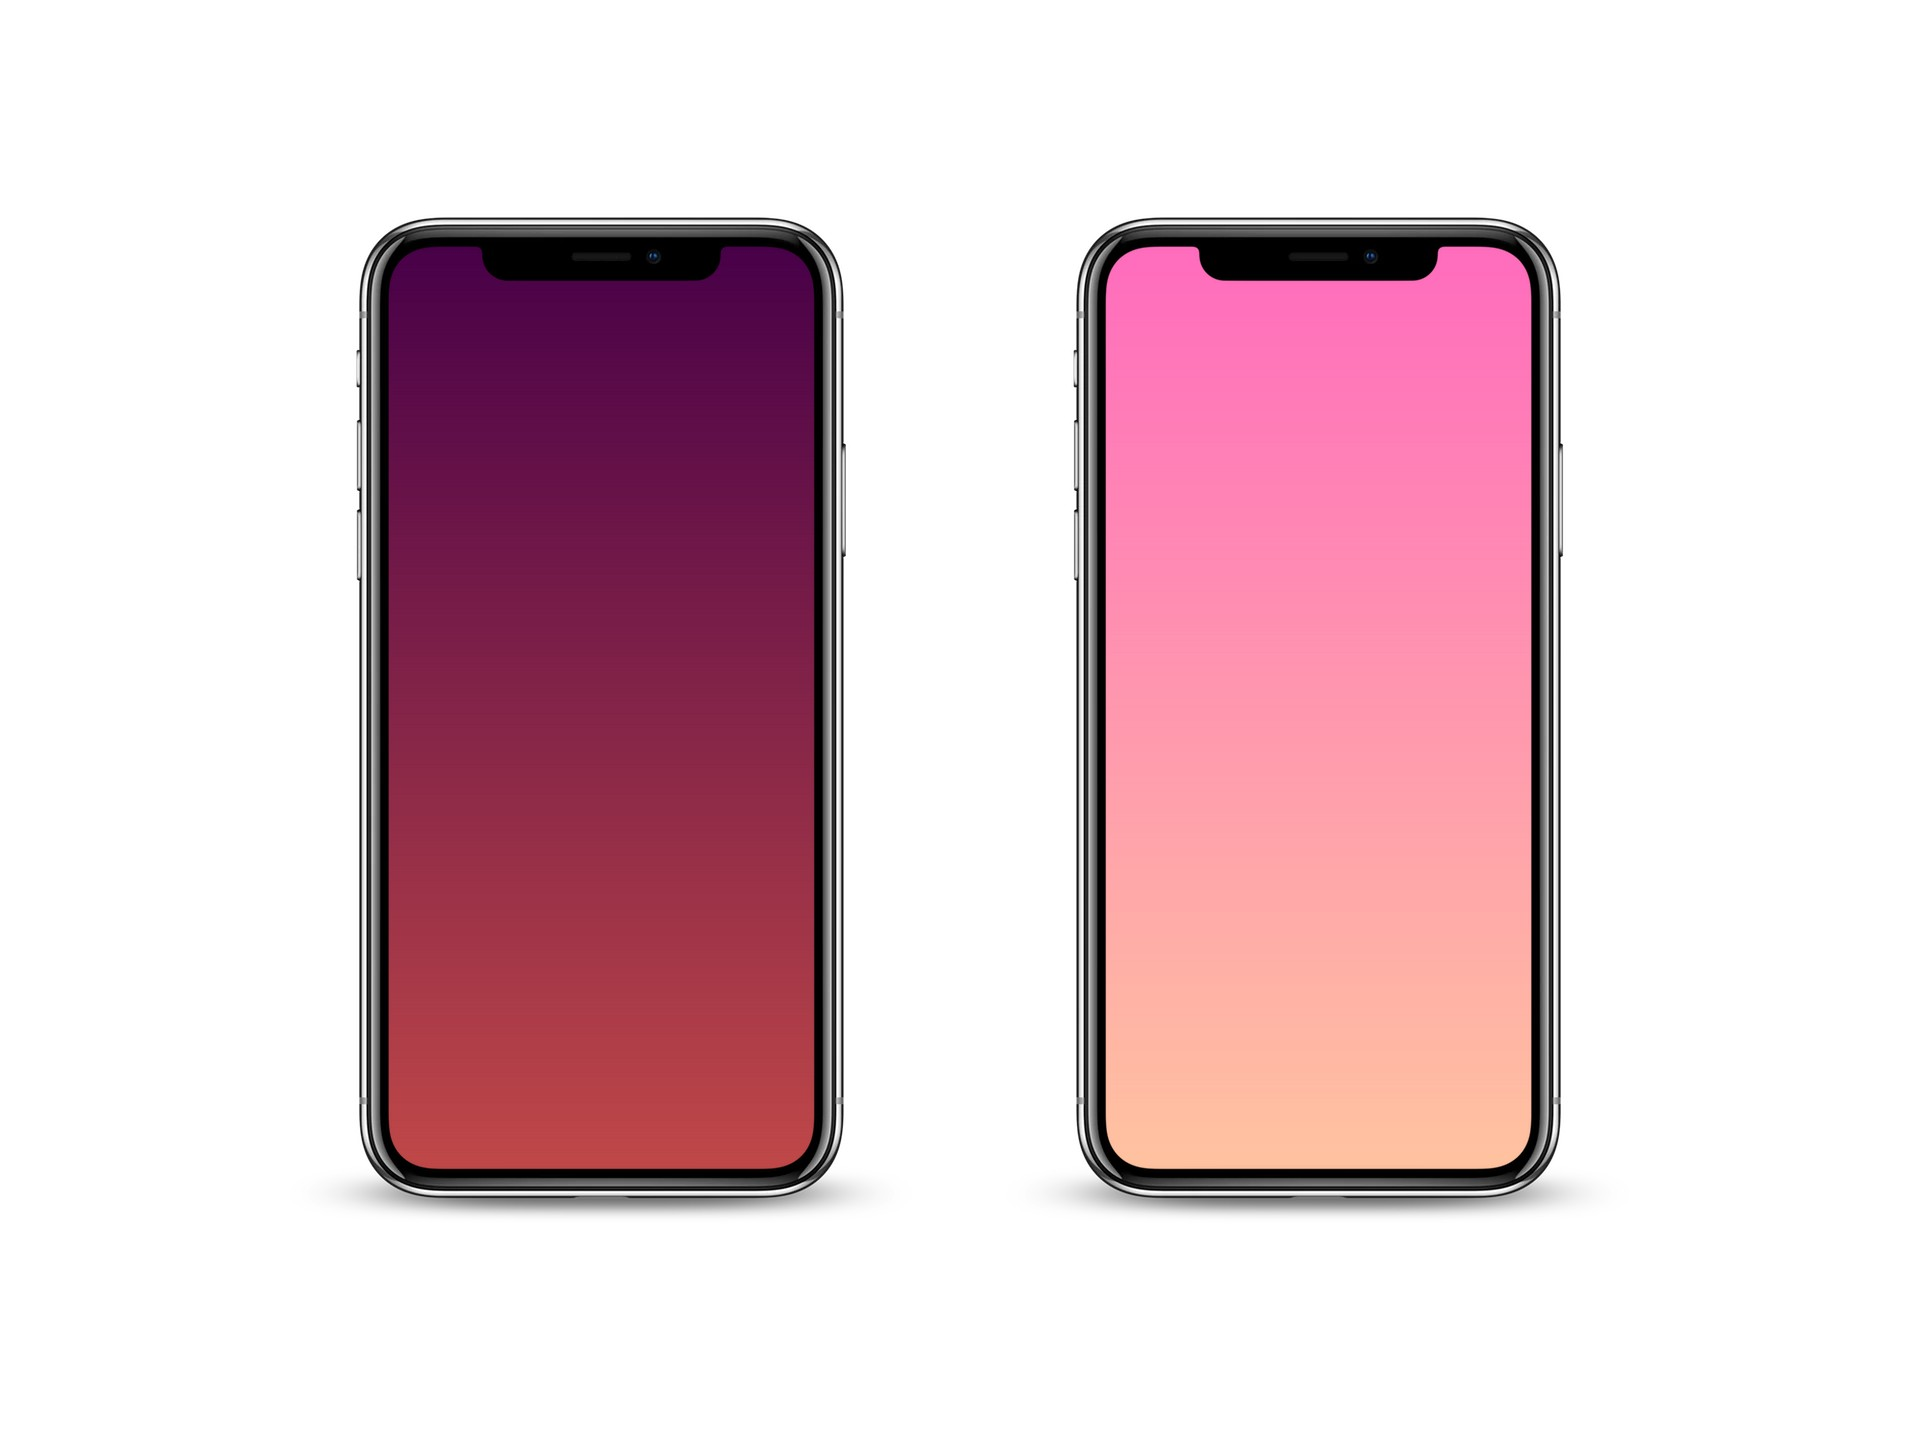 Iphone Gradient Wallpaper Pack Img 1